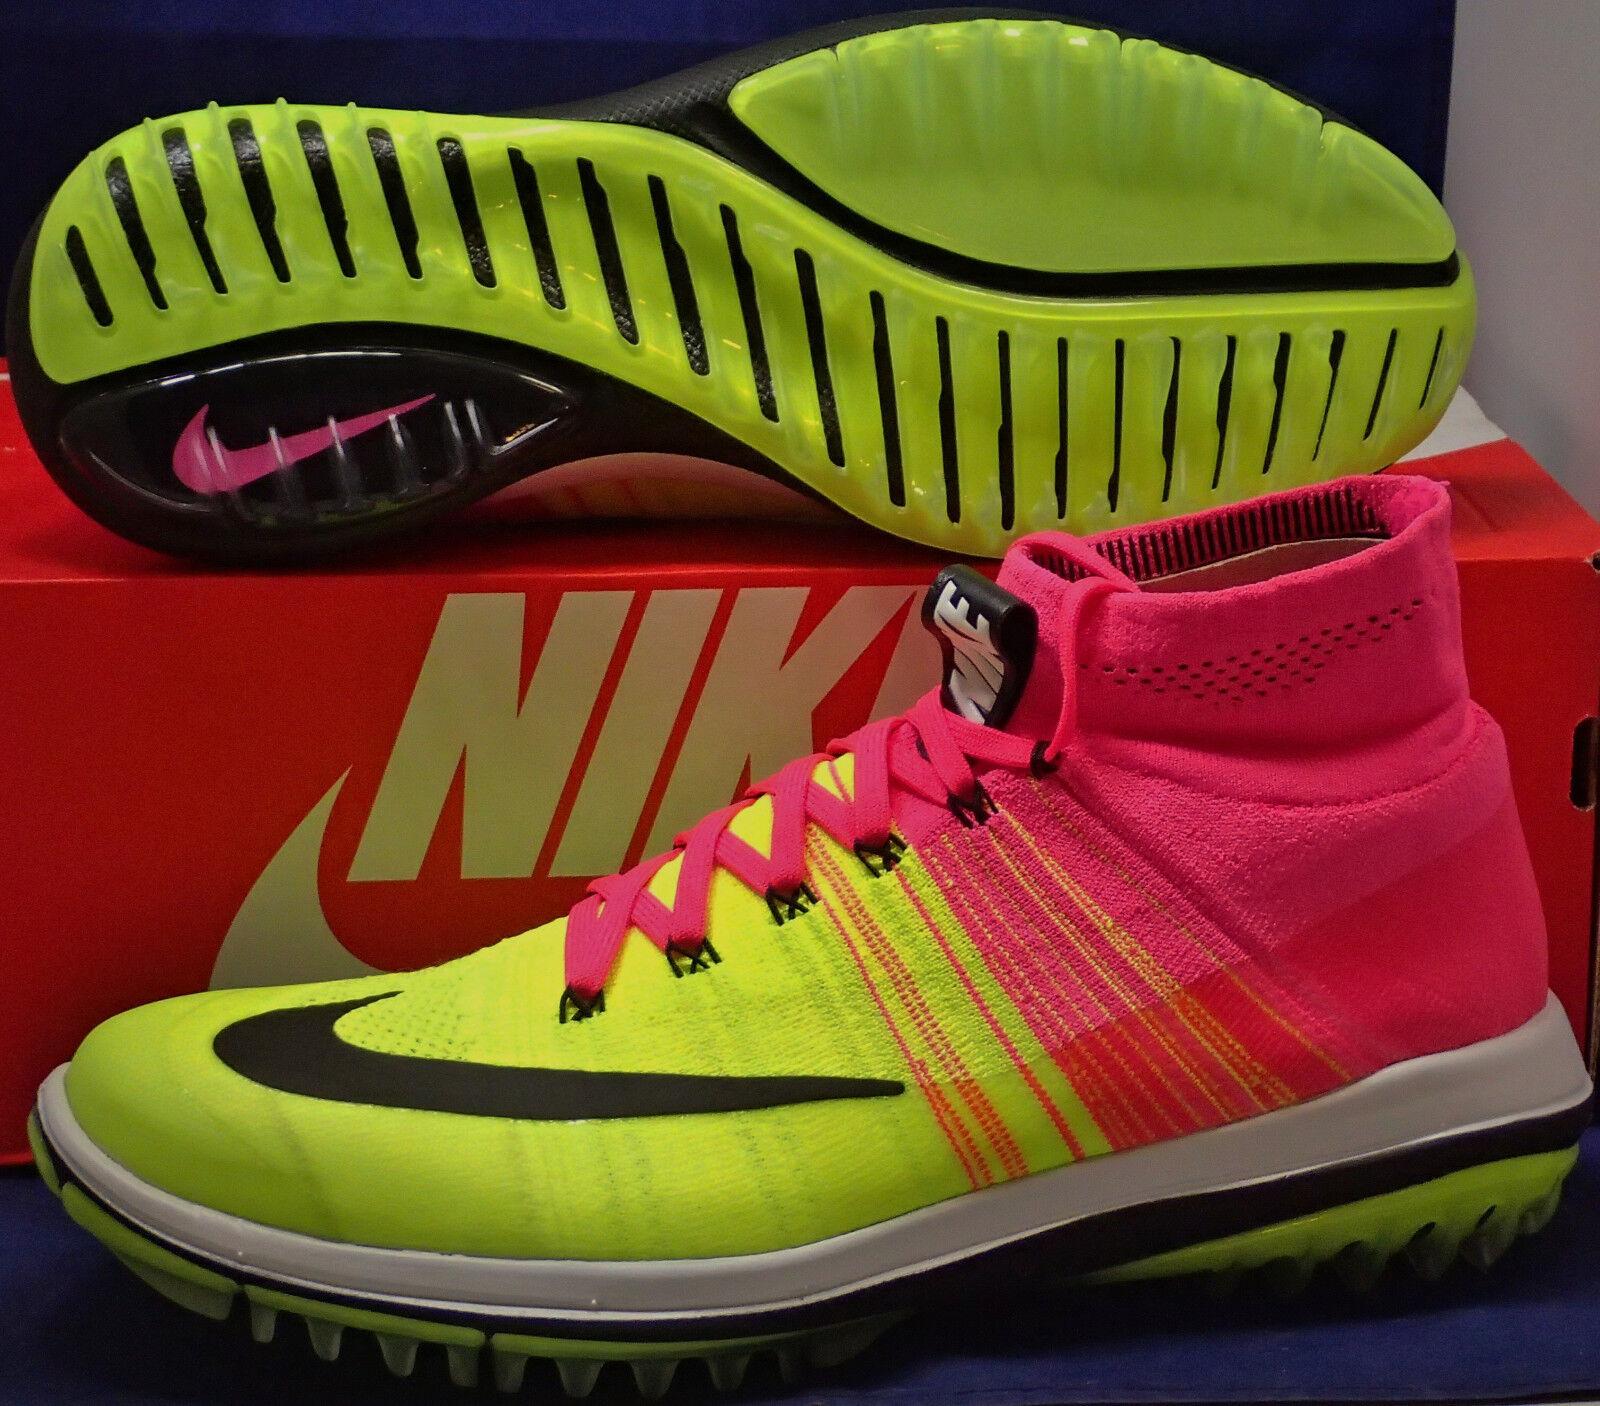 Nike Flyknit Elite Golf Shoes Pink Blast Black Volt White SZ 9.5 ( 844450-600 )